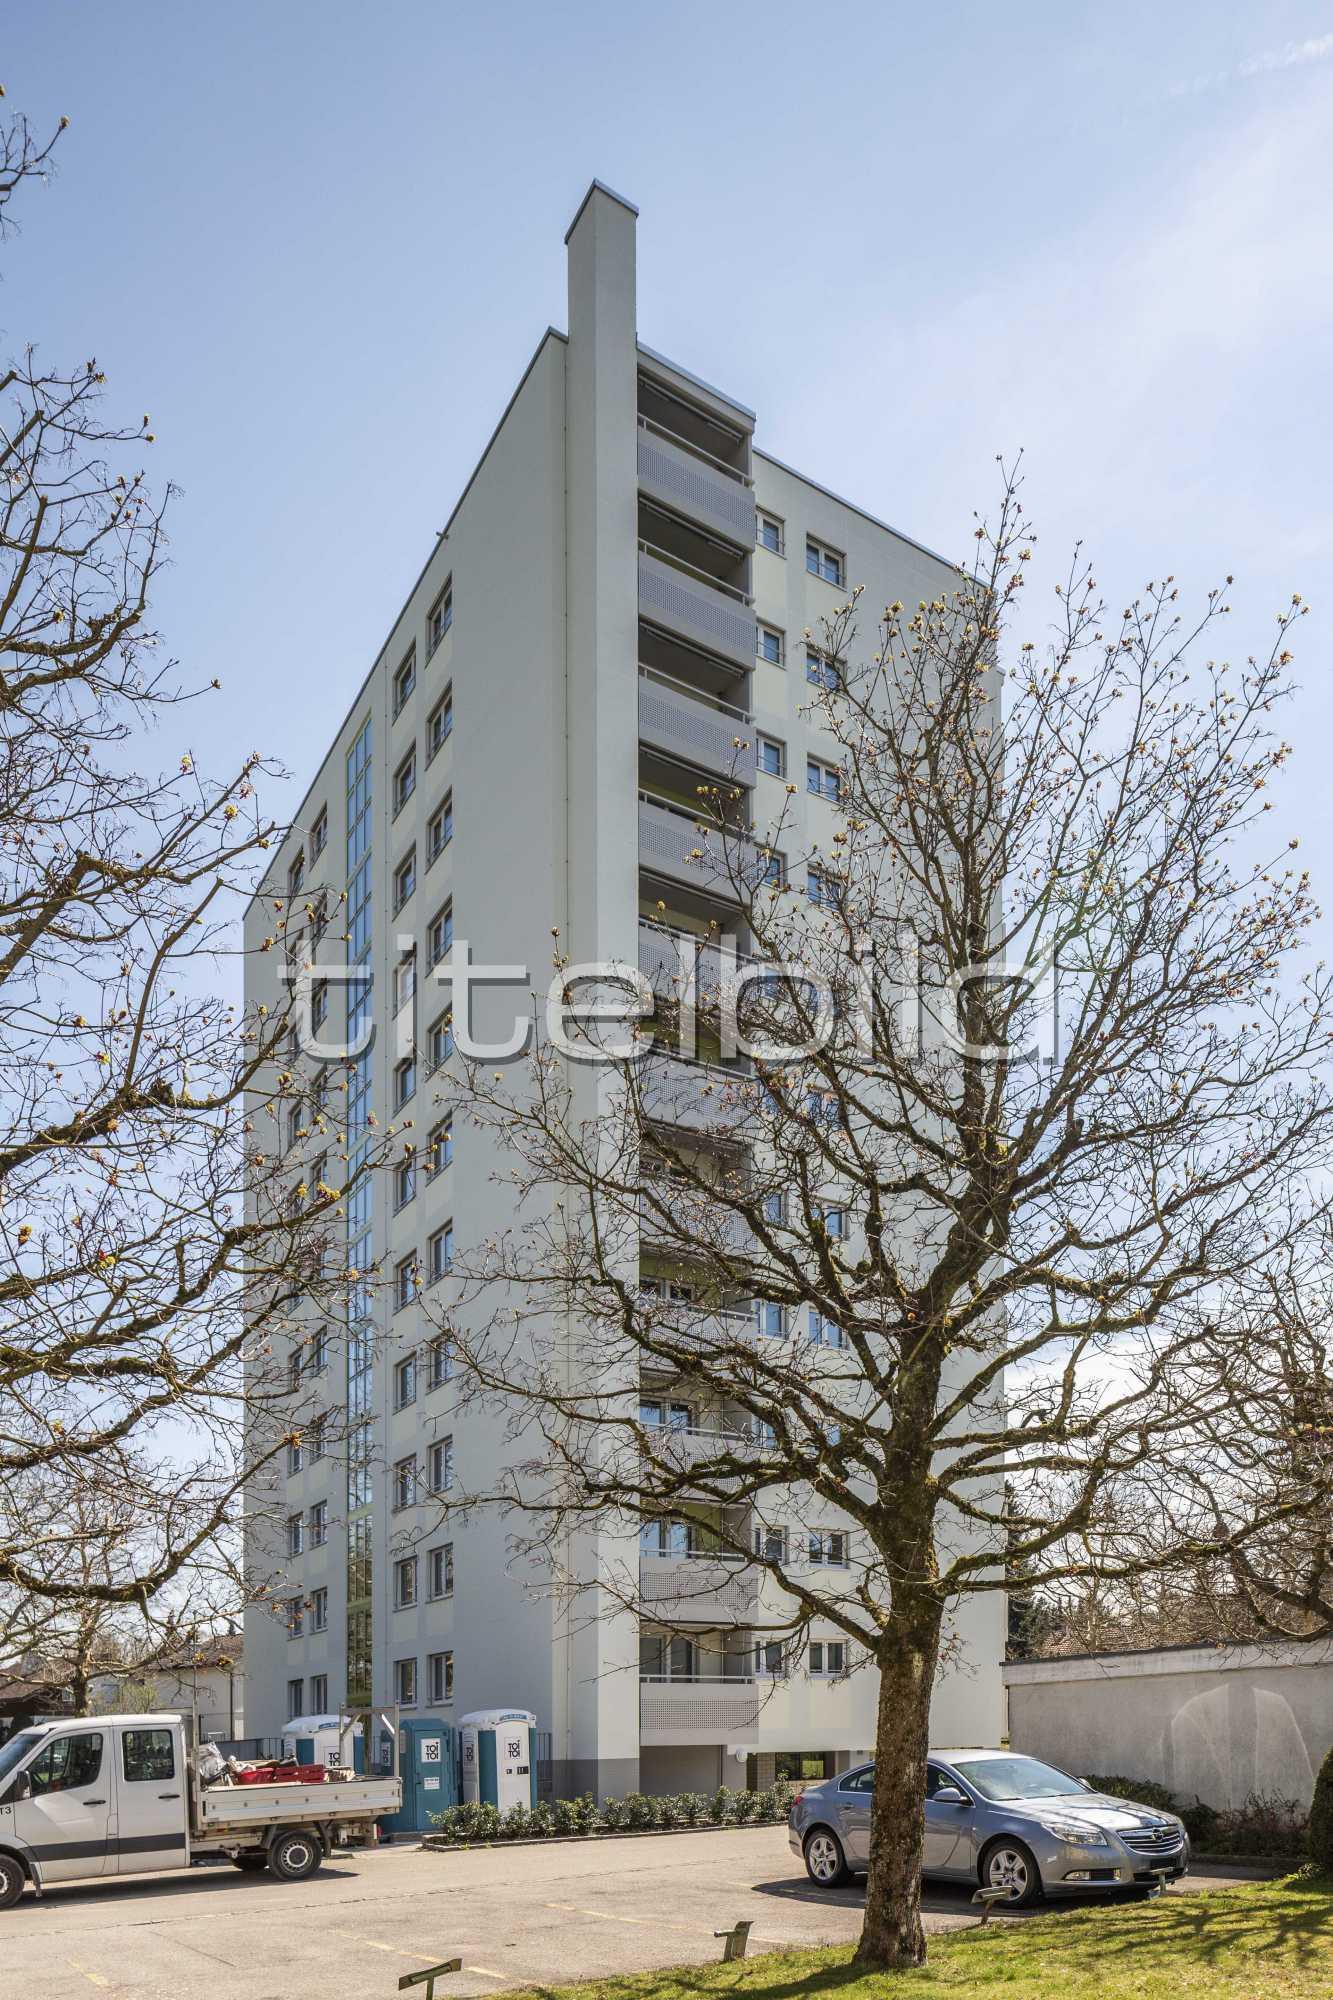 Projektbild-Nr. 6: Waldhofstrasse 54